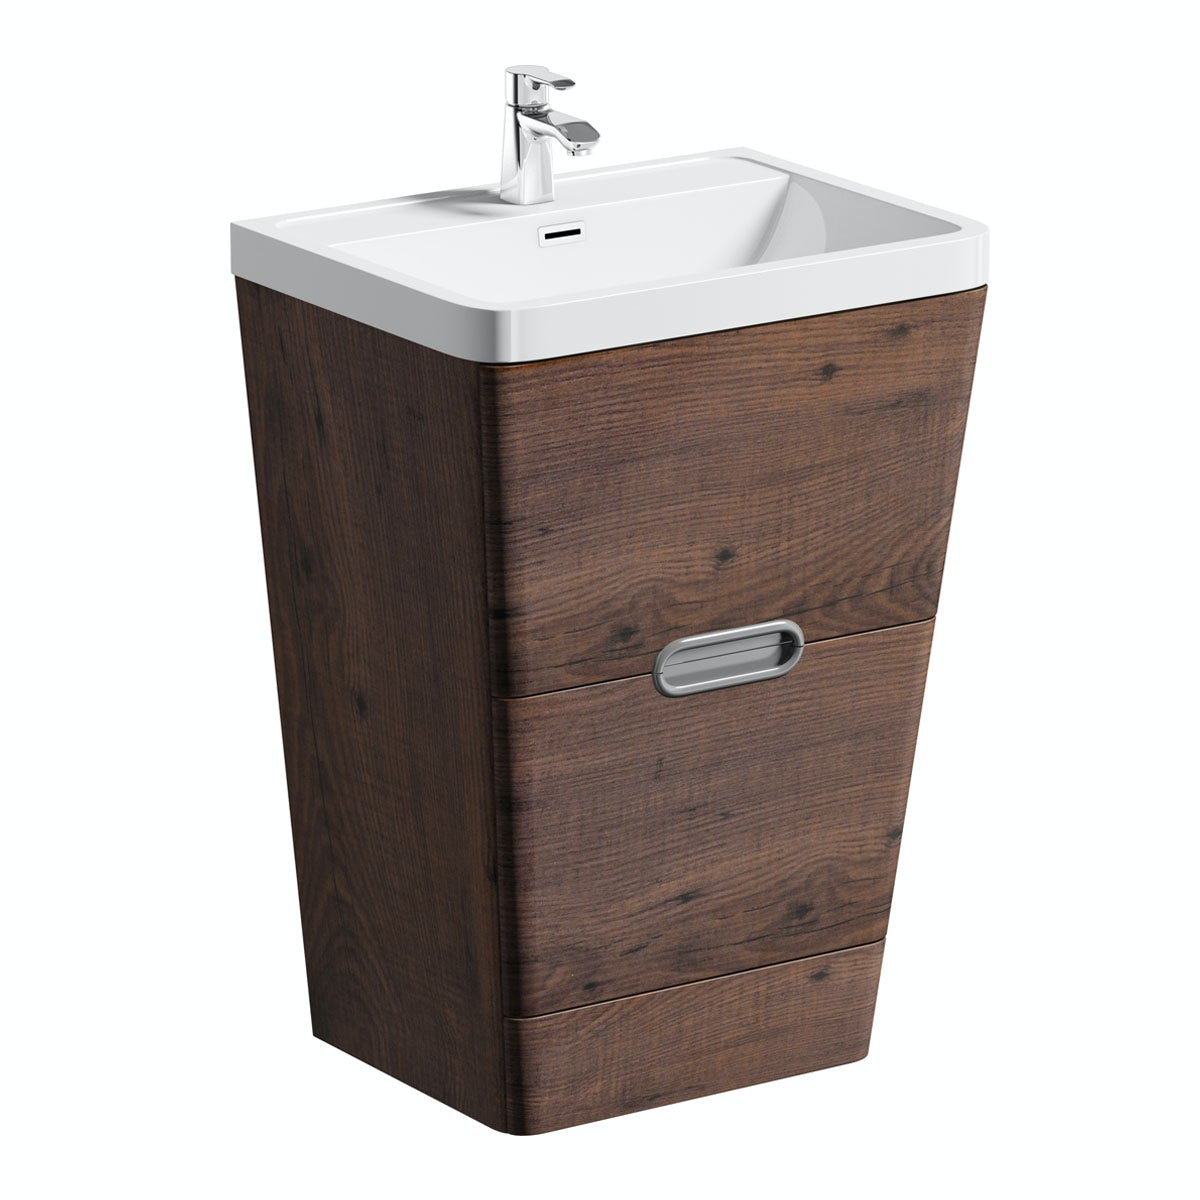 Sherwood chestnut 600 floor standing vanity unit and resin basin